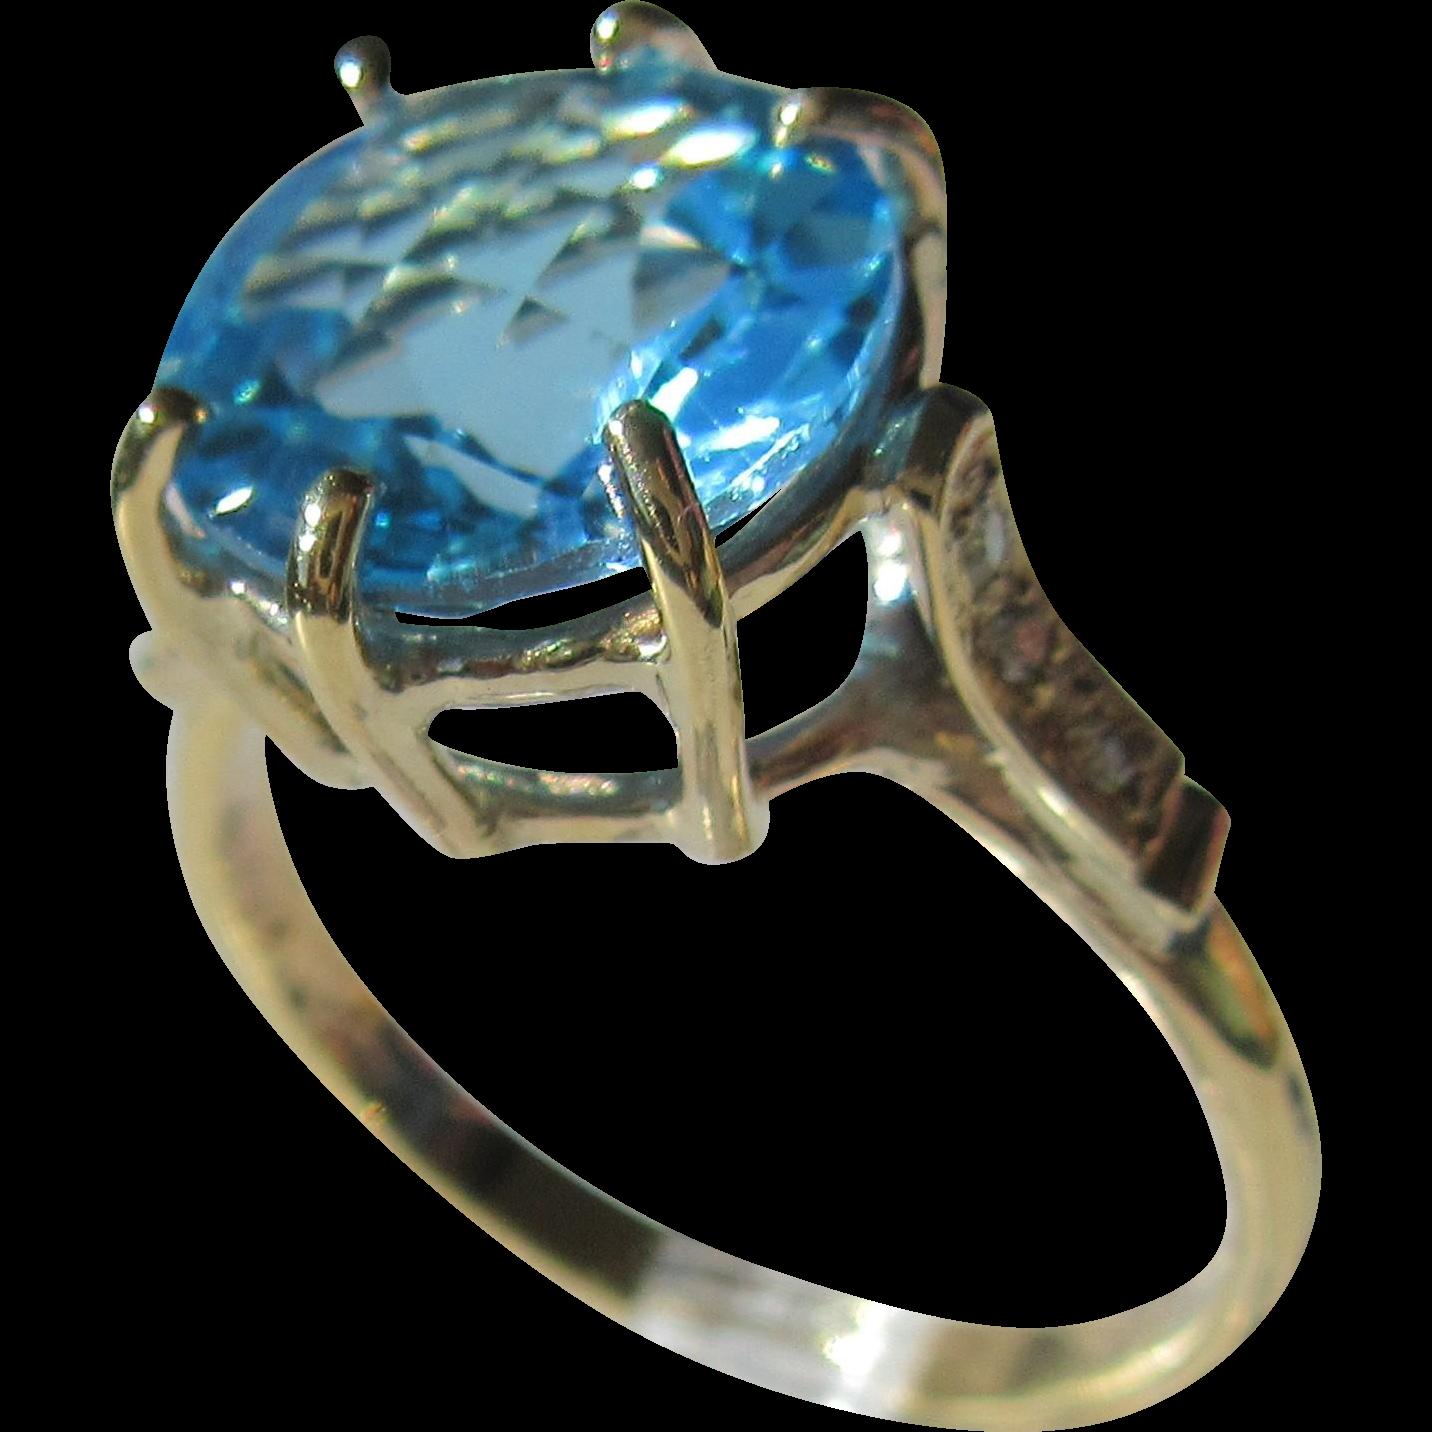 9kt Yellow Gold Vibrant Round Blue Topaz and Diamond Artisan Ladies Ring